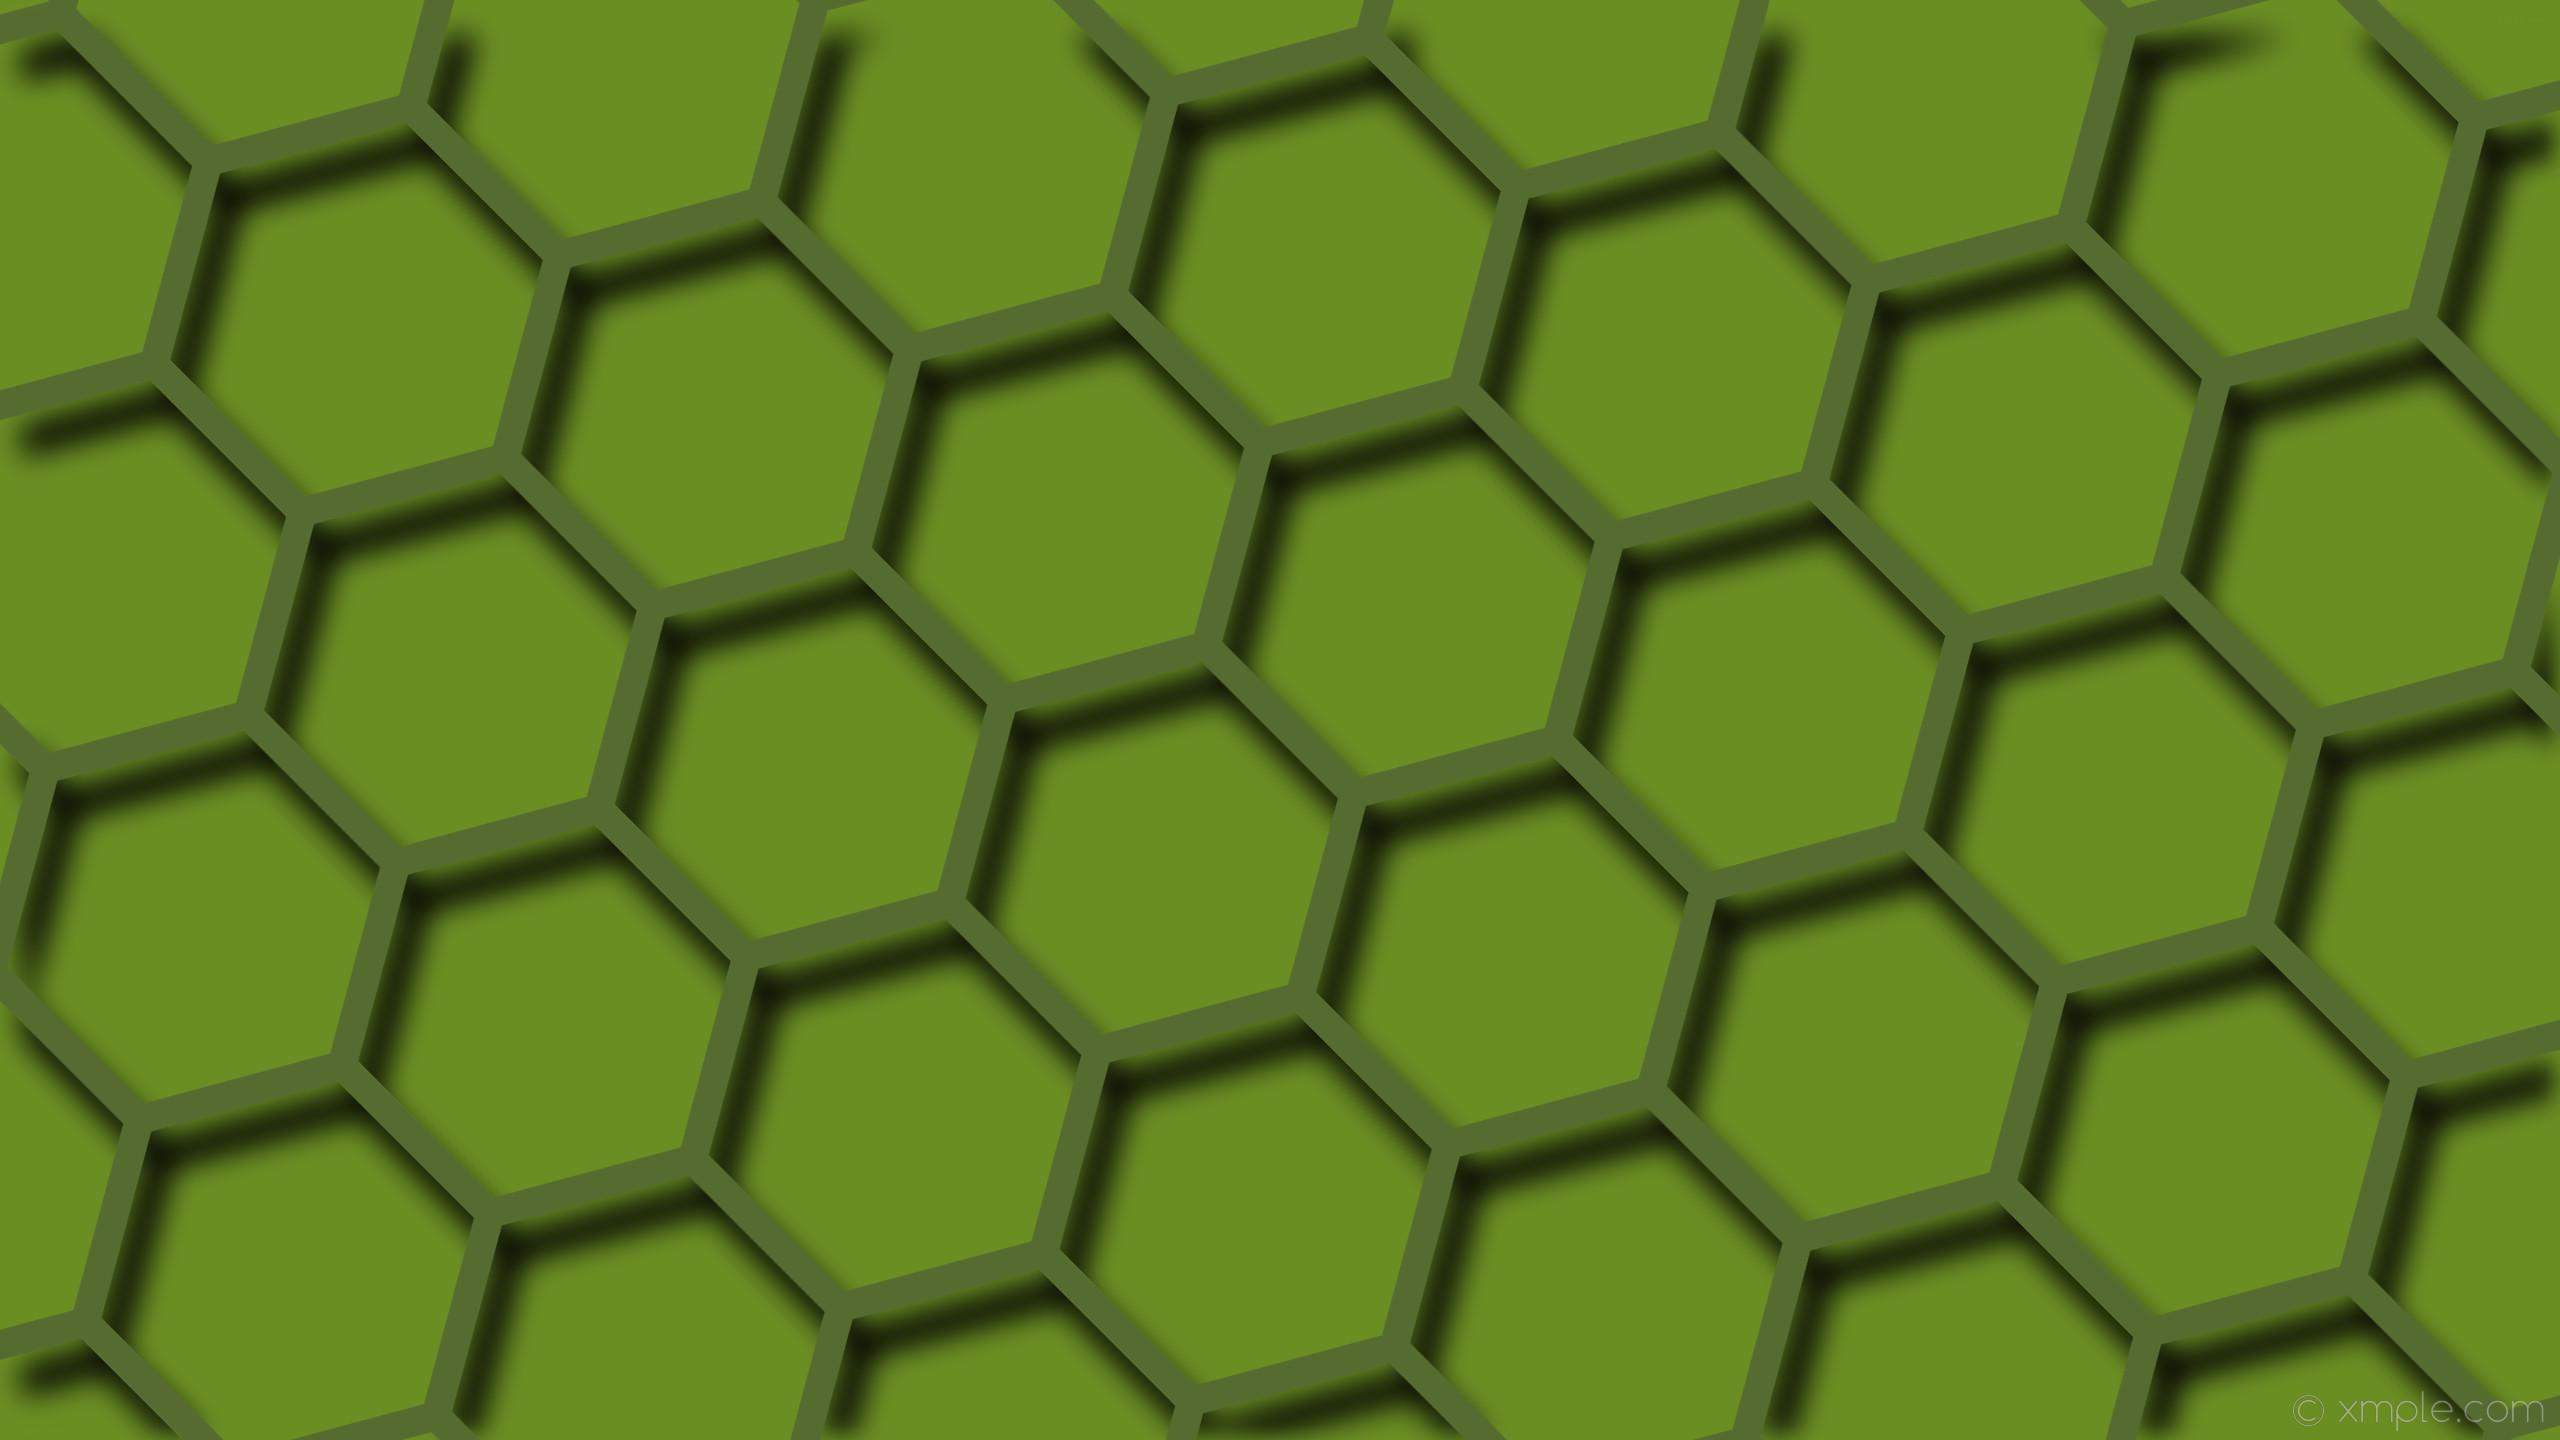 Res: 2560x1440, wallpaper beehive green hexagon drop shadow dark olive green olive drab  #556b2f #6b8e23 45